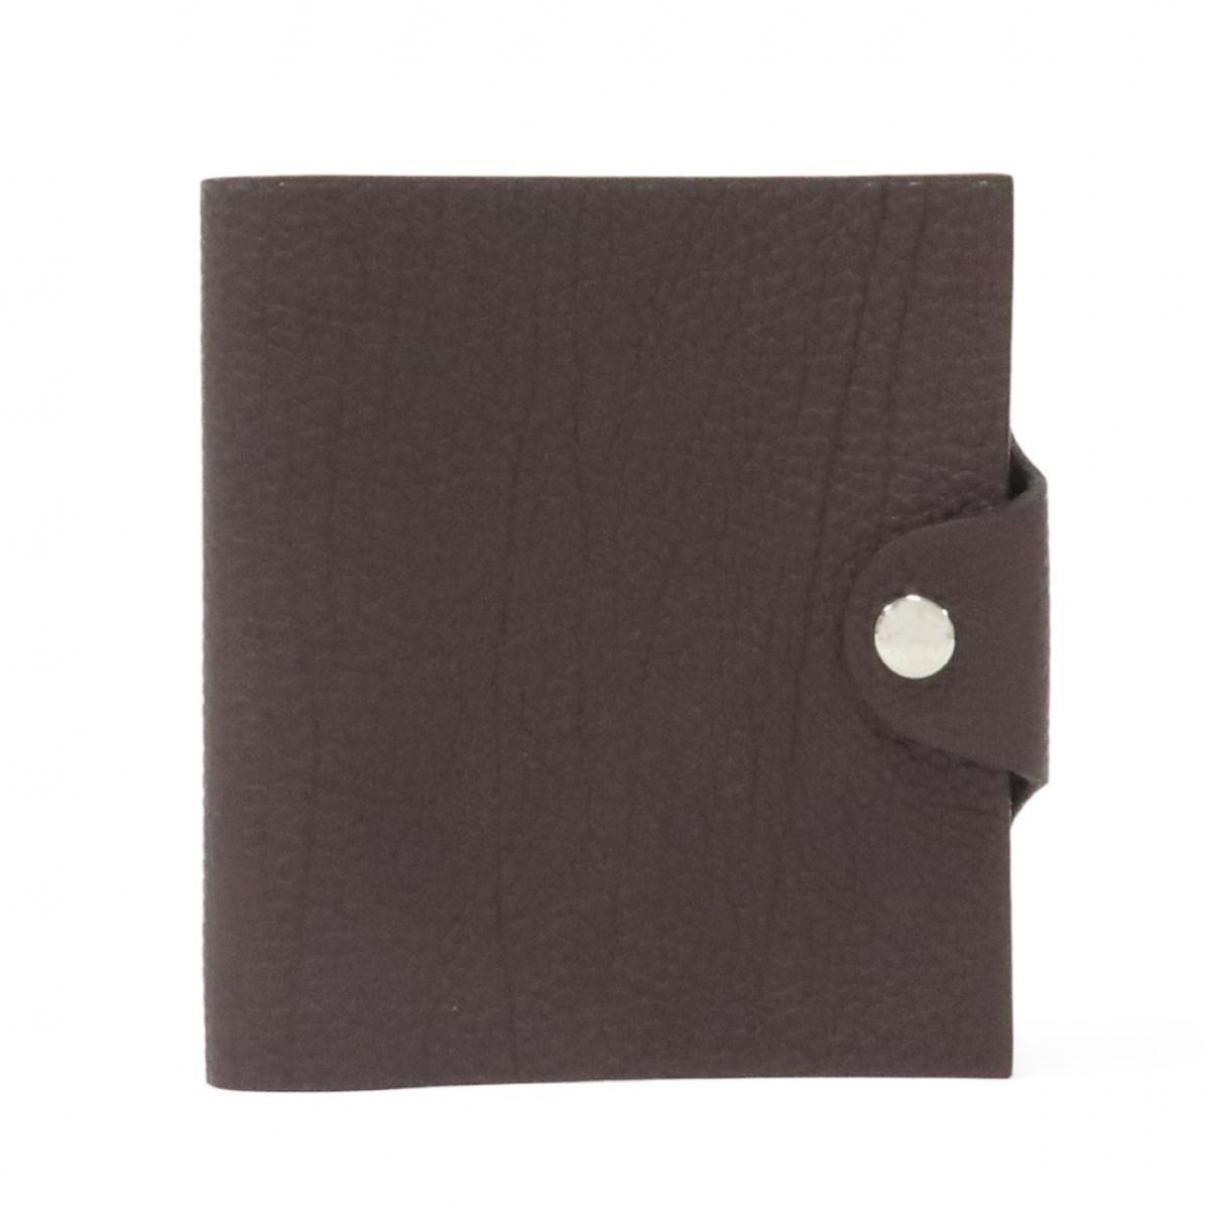 Hermès \N Brown Leather Purses, wallet & cases for Women \N